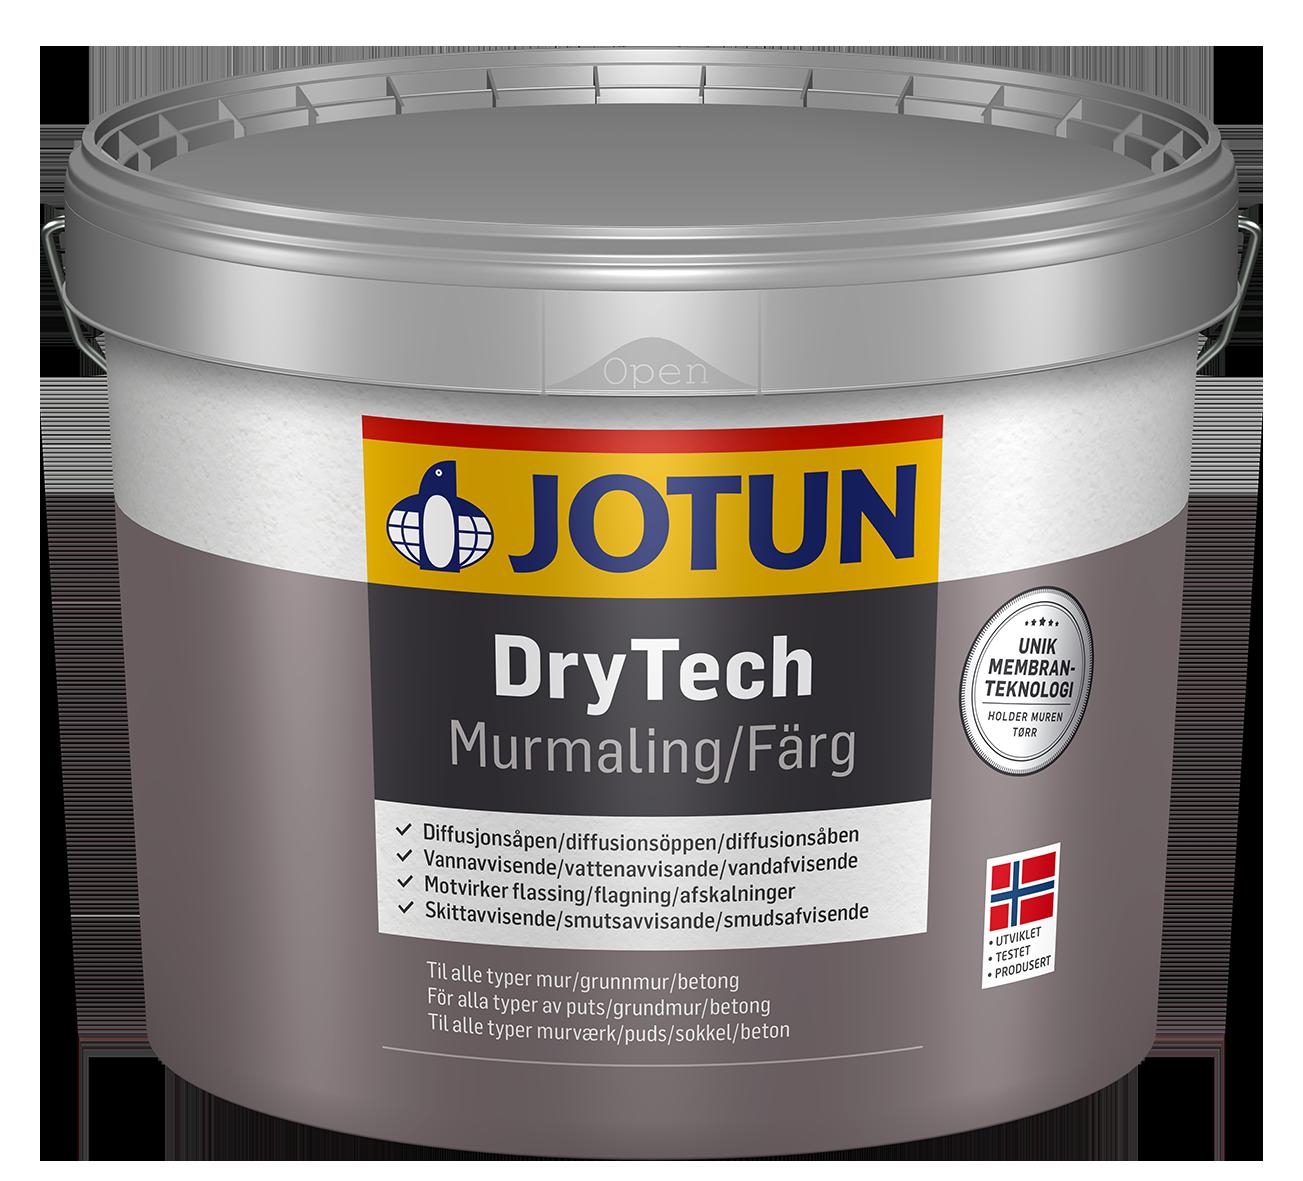 JOTUN DryTech Murfärg